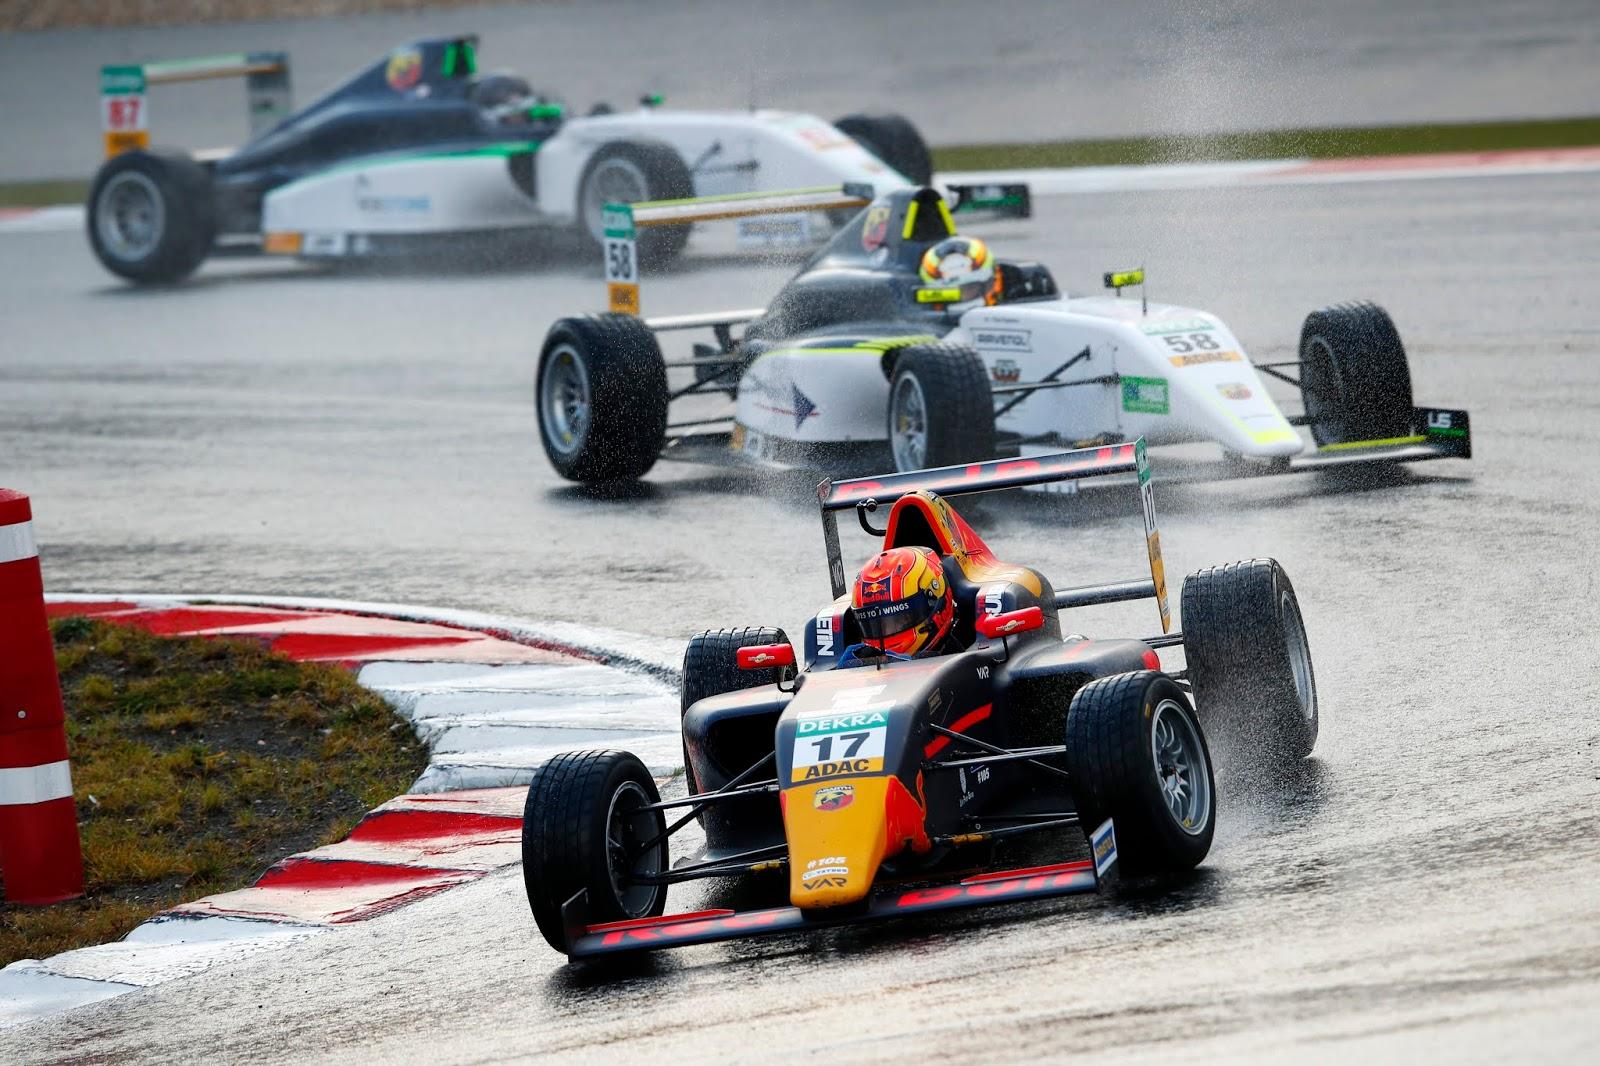 01 ADAC2BF4252C2BN25C325BCrburgring2B Jonny2BEdgar252C2BVan2BAmersfoort2BRacing Τελευταίος γύρος του FIA R-GT Cup στο ACI Rally Monza και τελευταίος γύρος του Ιταλικού Πρωταθλήματος της F4 στην πίστα της Vallelunga